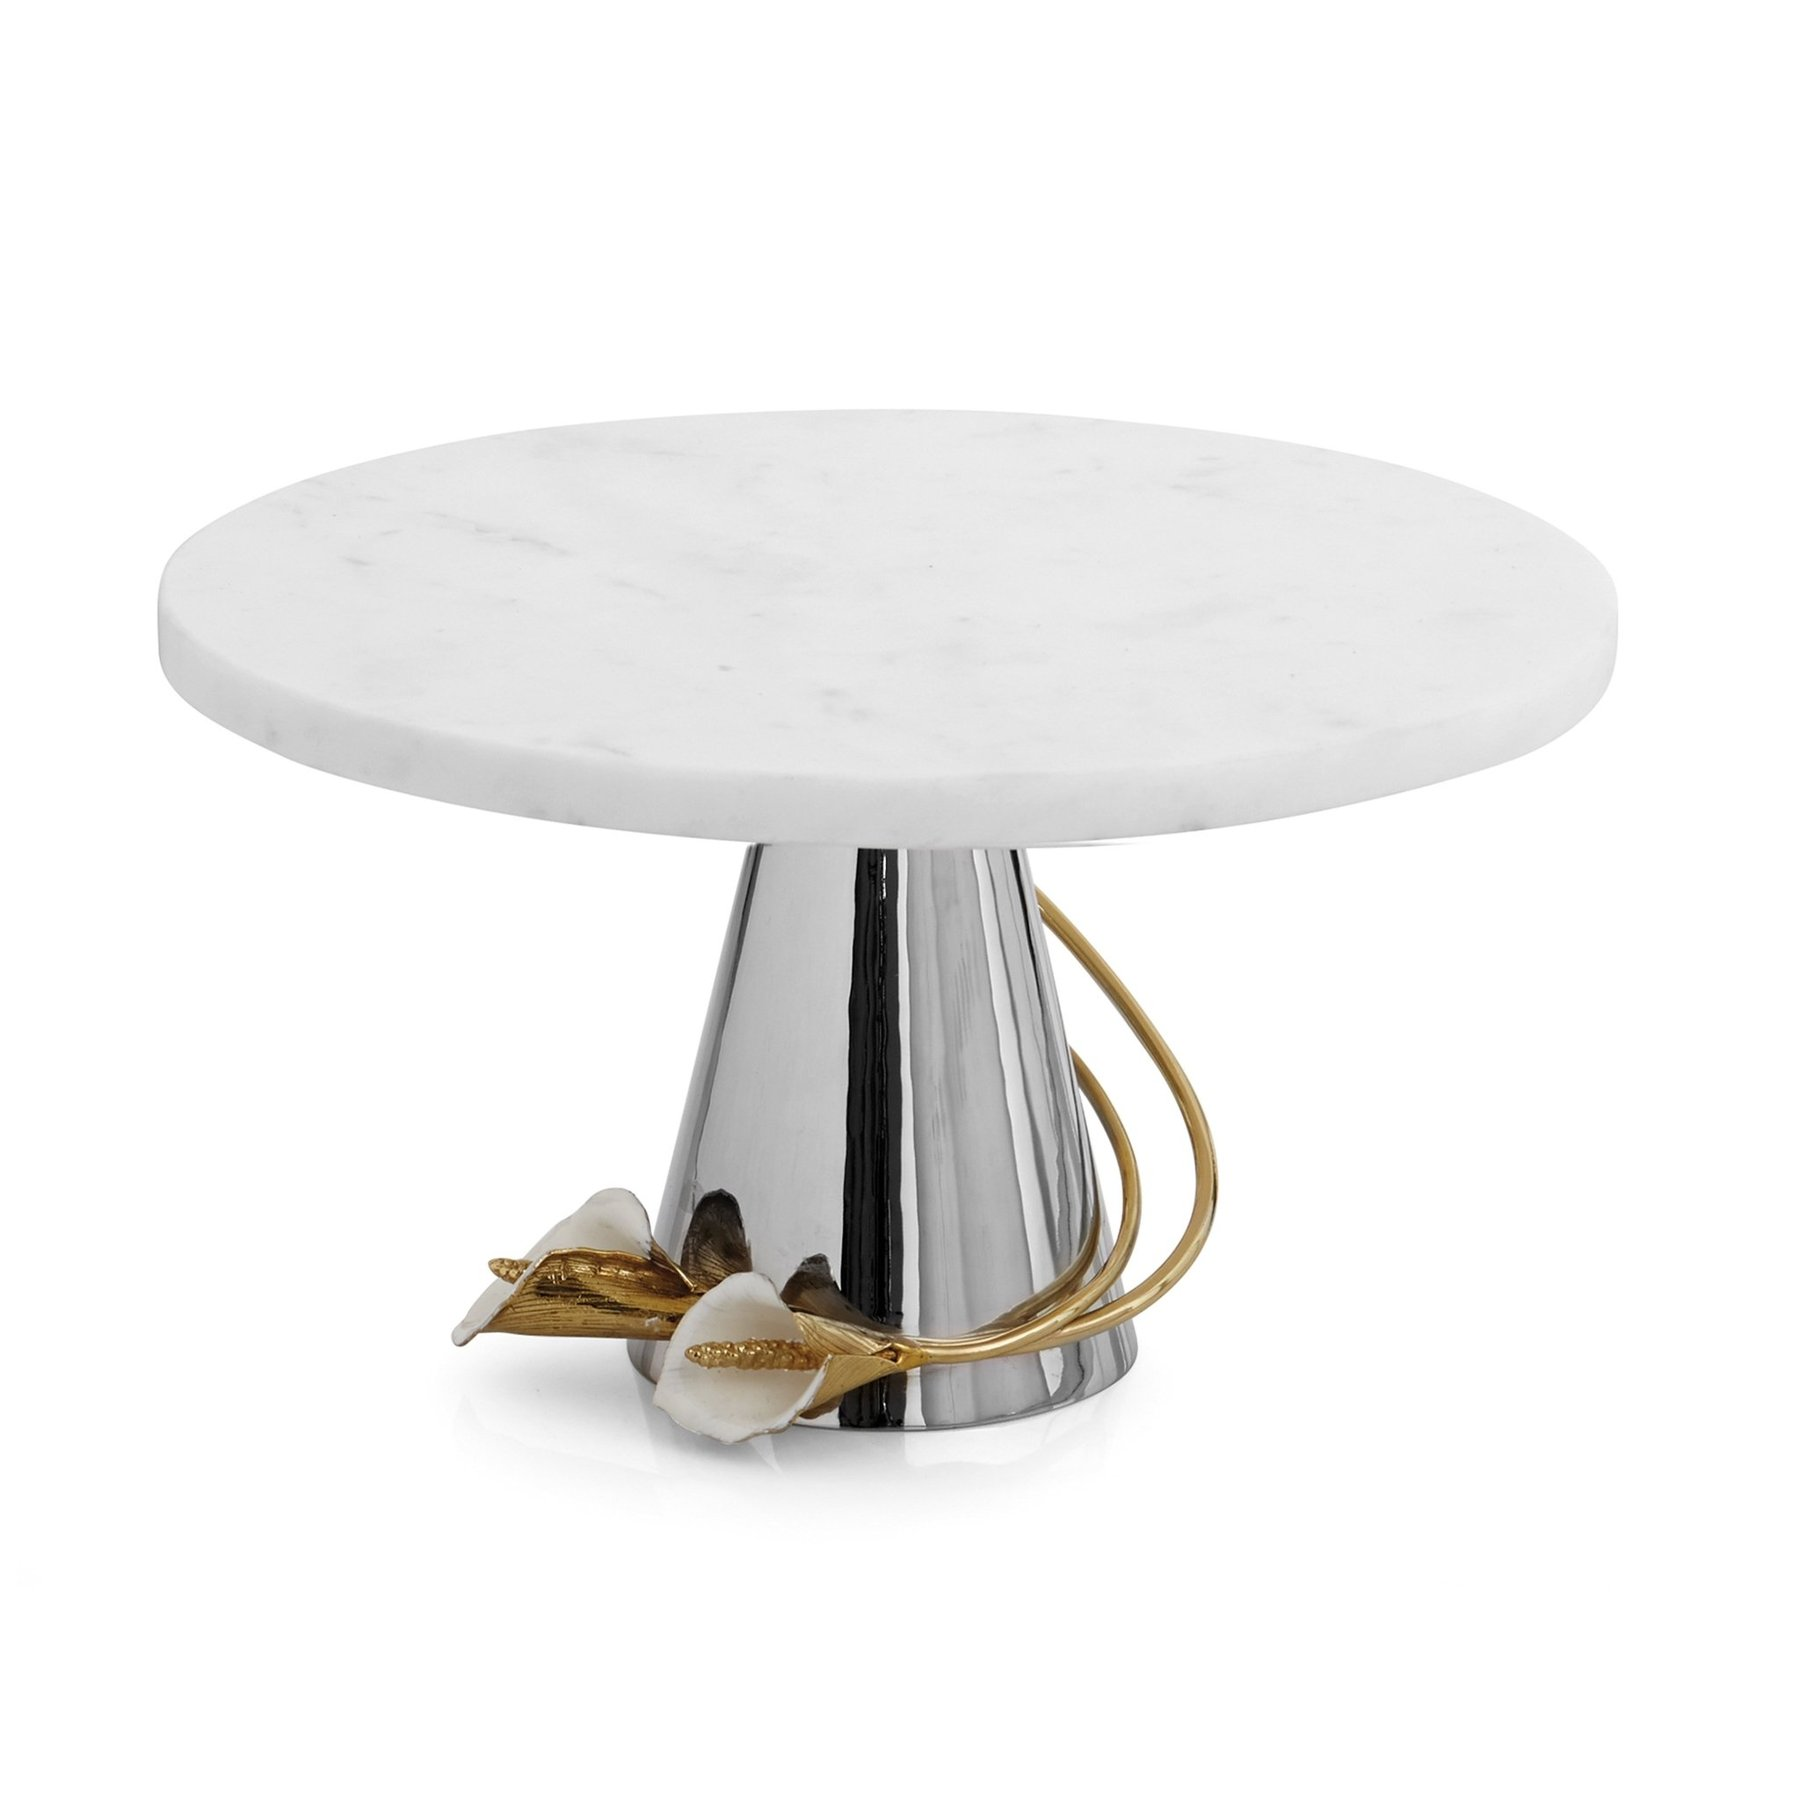 michael-aram-calla-lily-cake-stand-195824_1800x1800